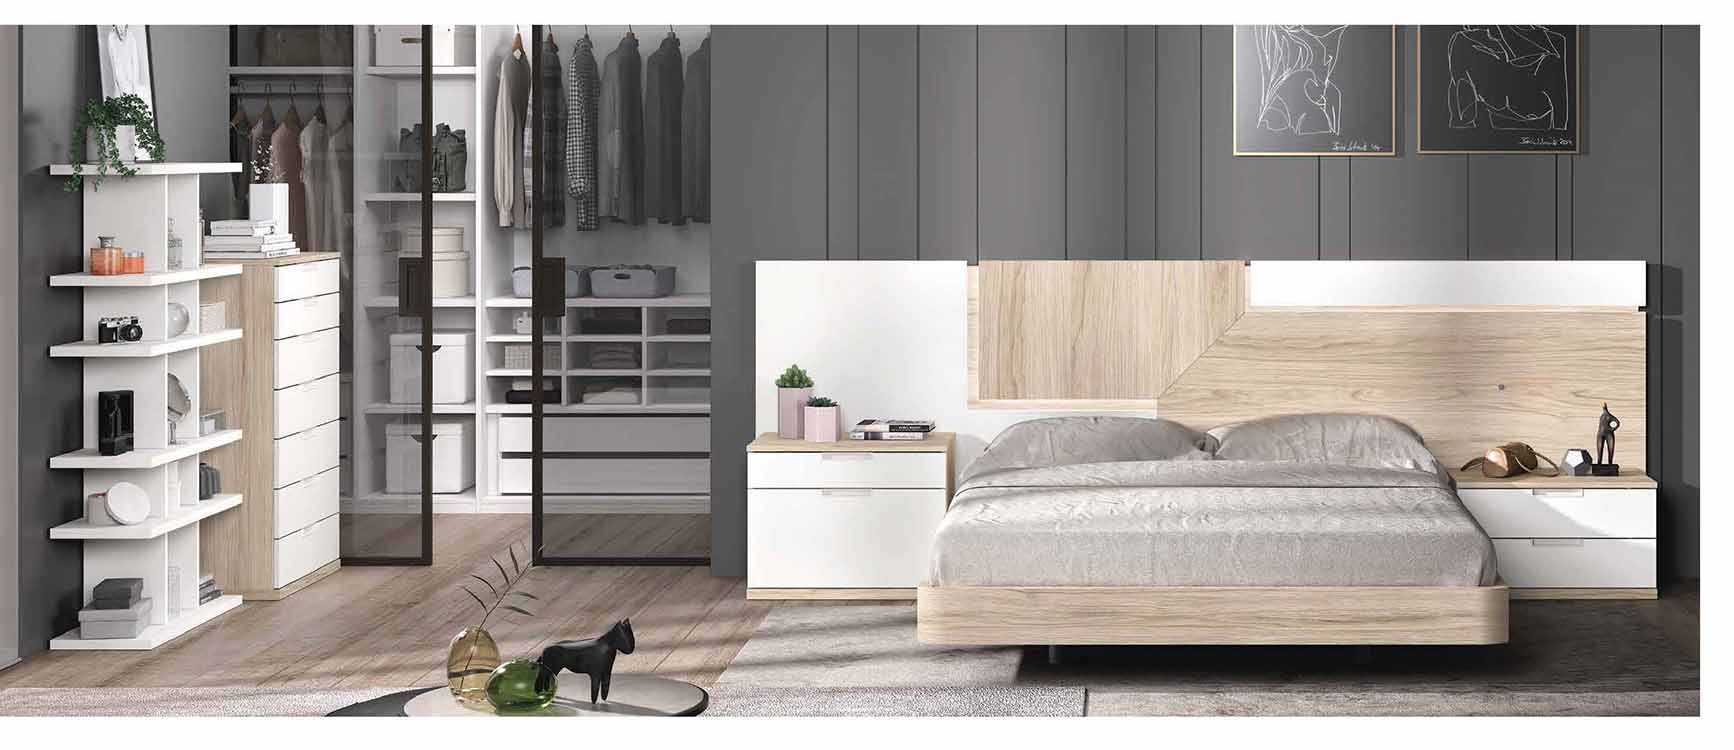 http://www.munozmuebles.net/nueva/catalogo/dormitorios2-2366-sauce.jpg - Ideas  sobre muebles diferentes